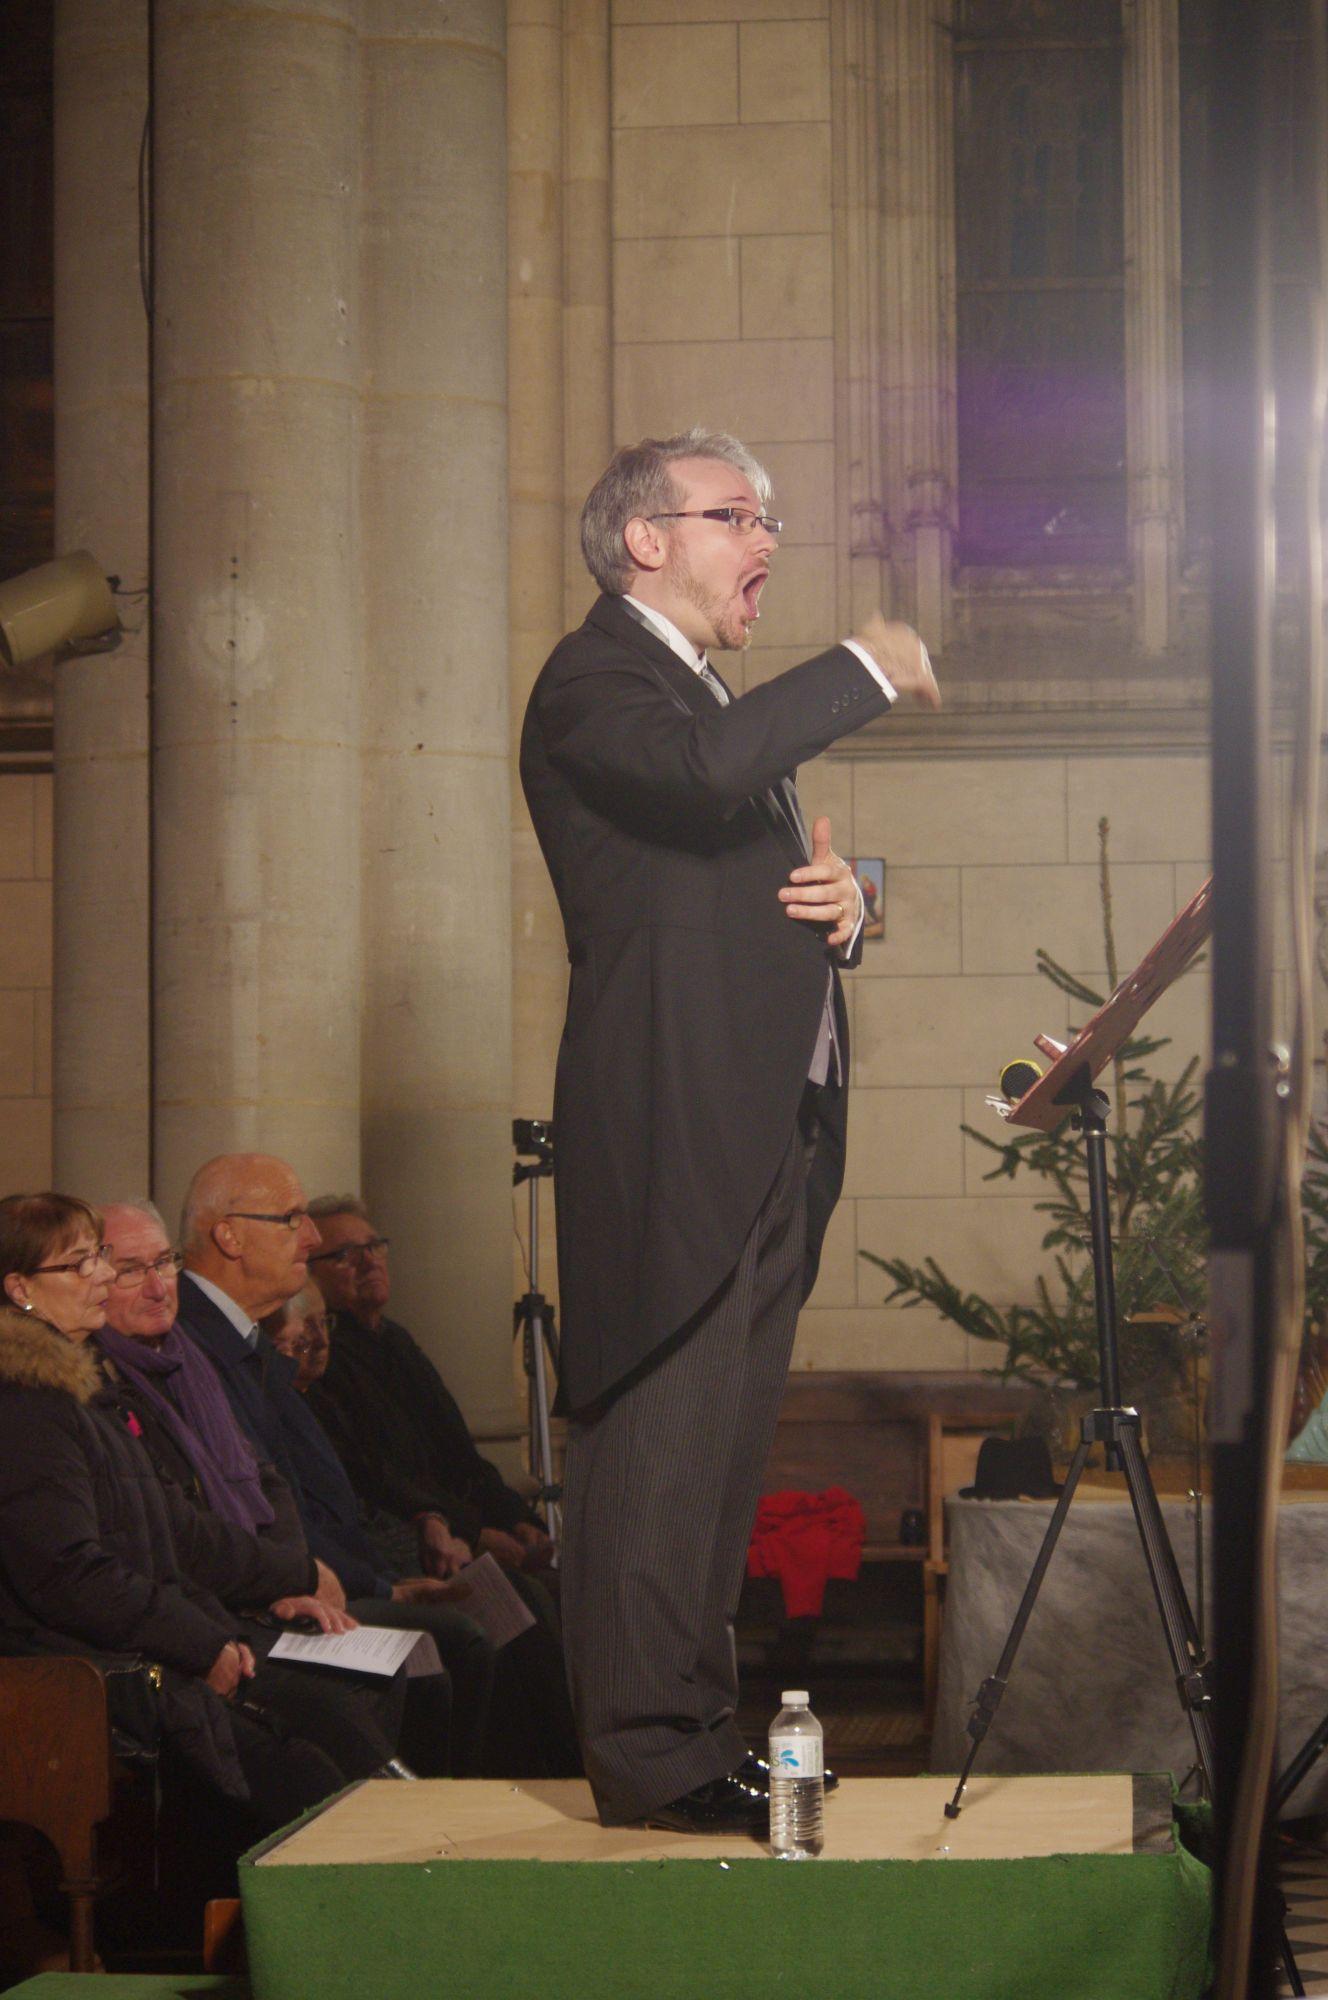 Sébastien Vauclin dirige L'OISEAU LYRE